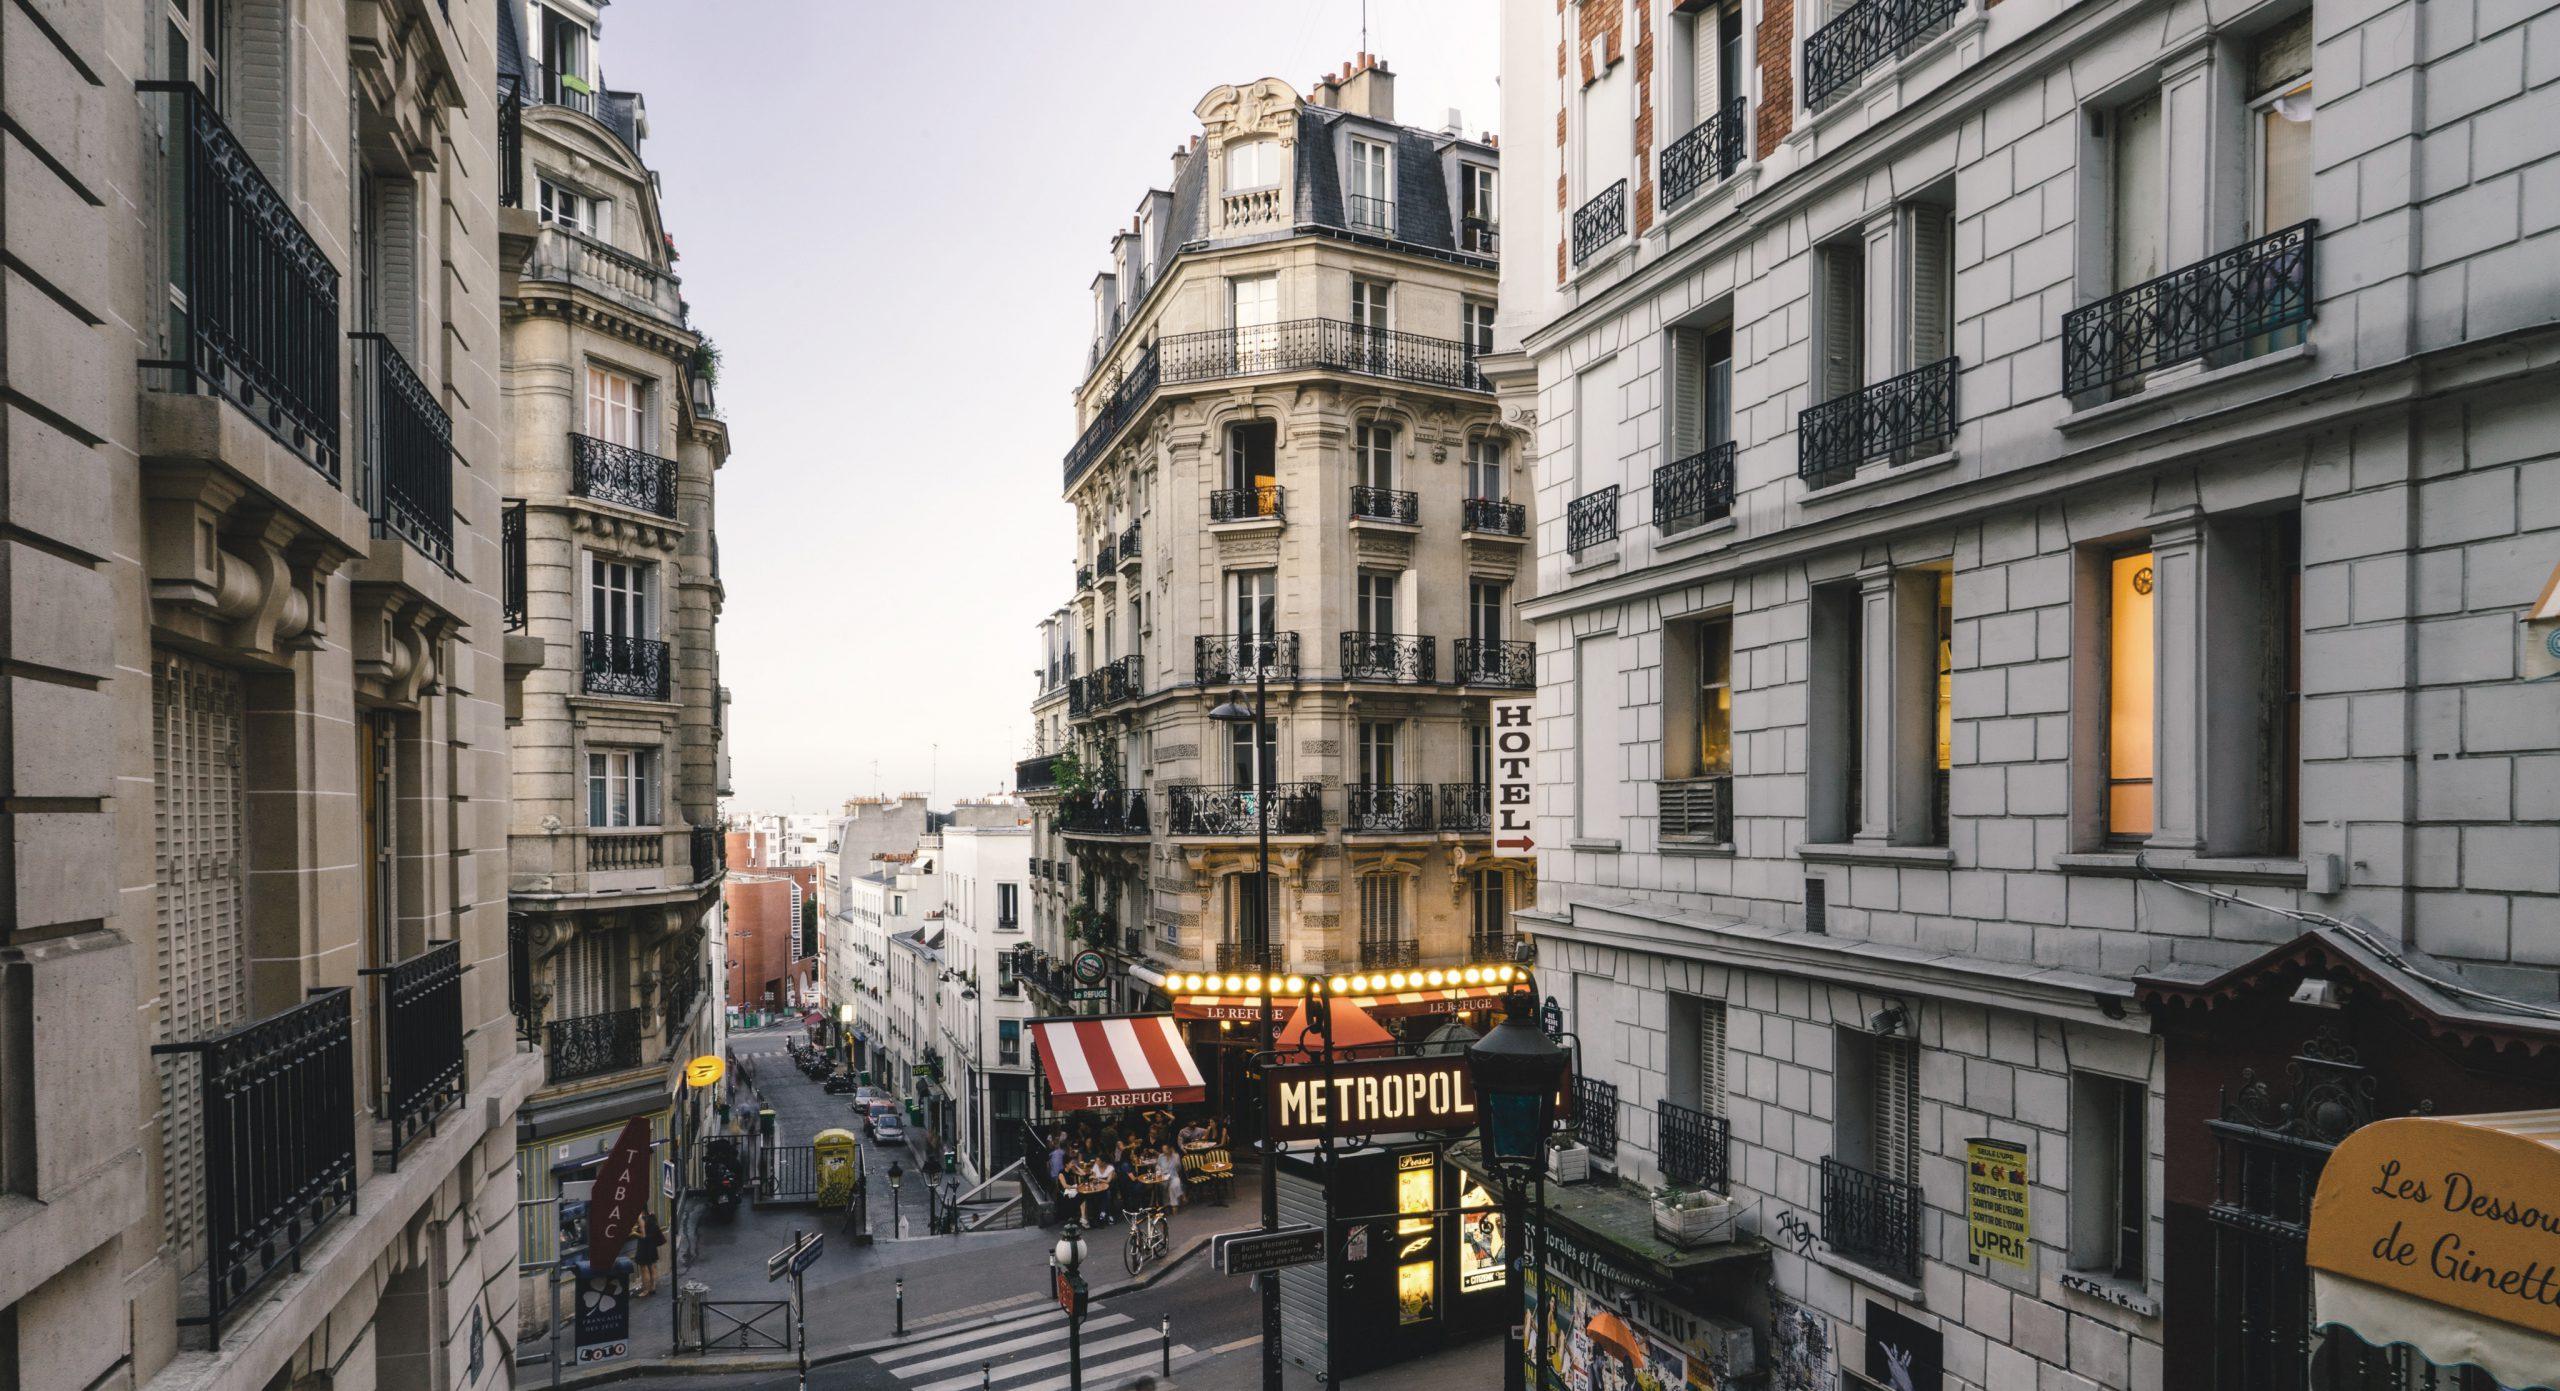 CITY GUIDE   15 AMAZING WAYS TO EXPLORE PARIS WITH KIDS